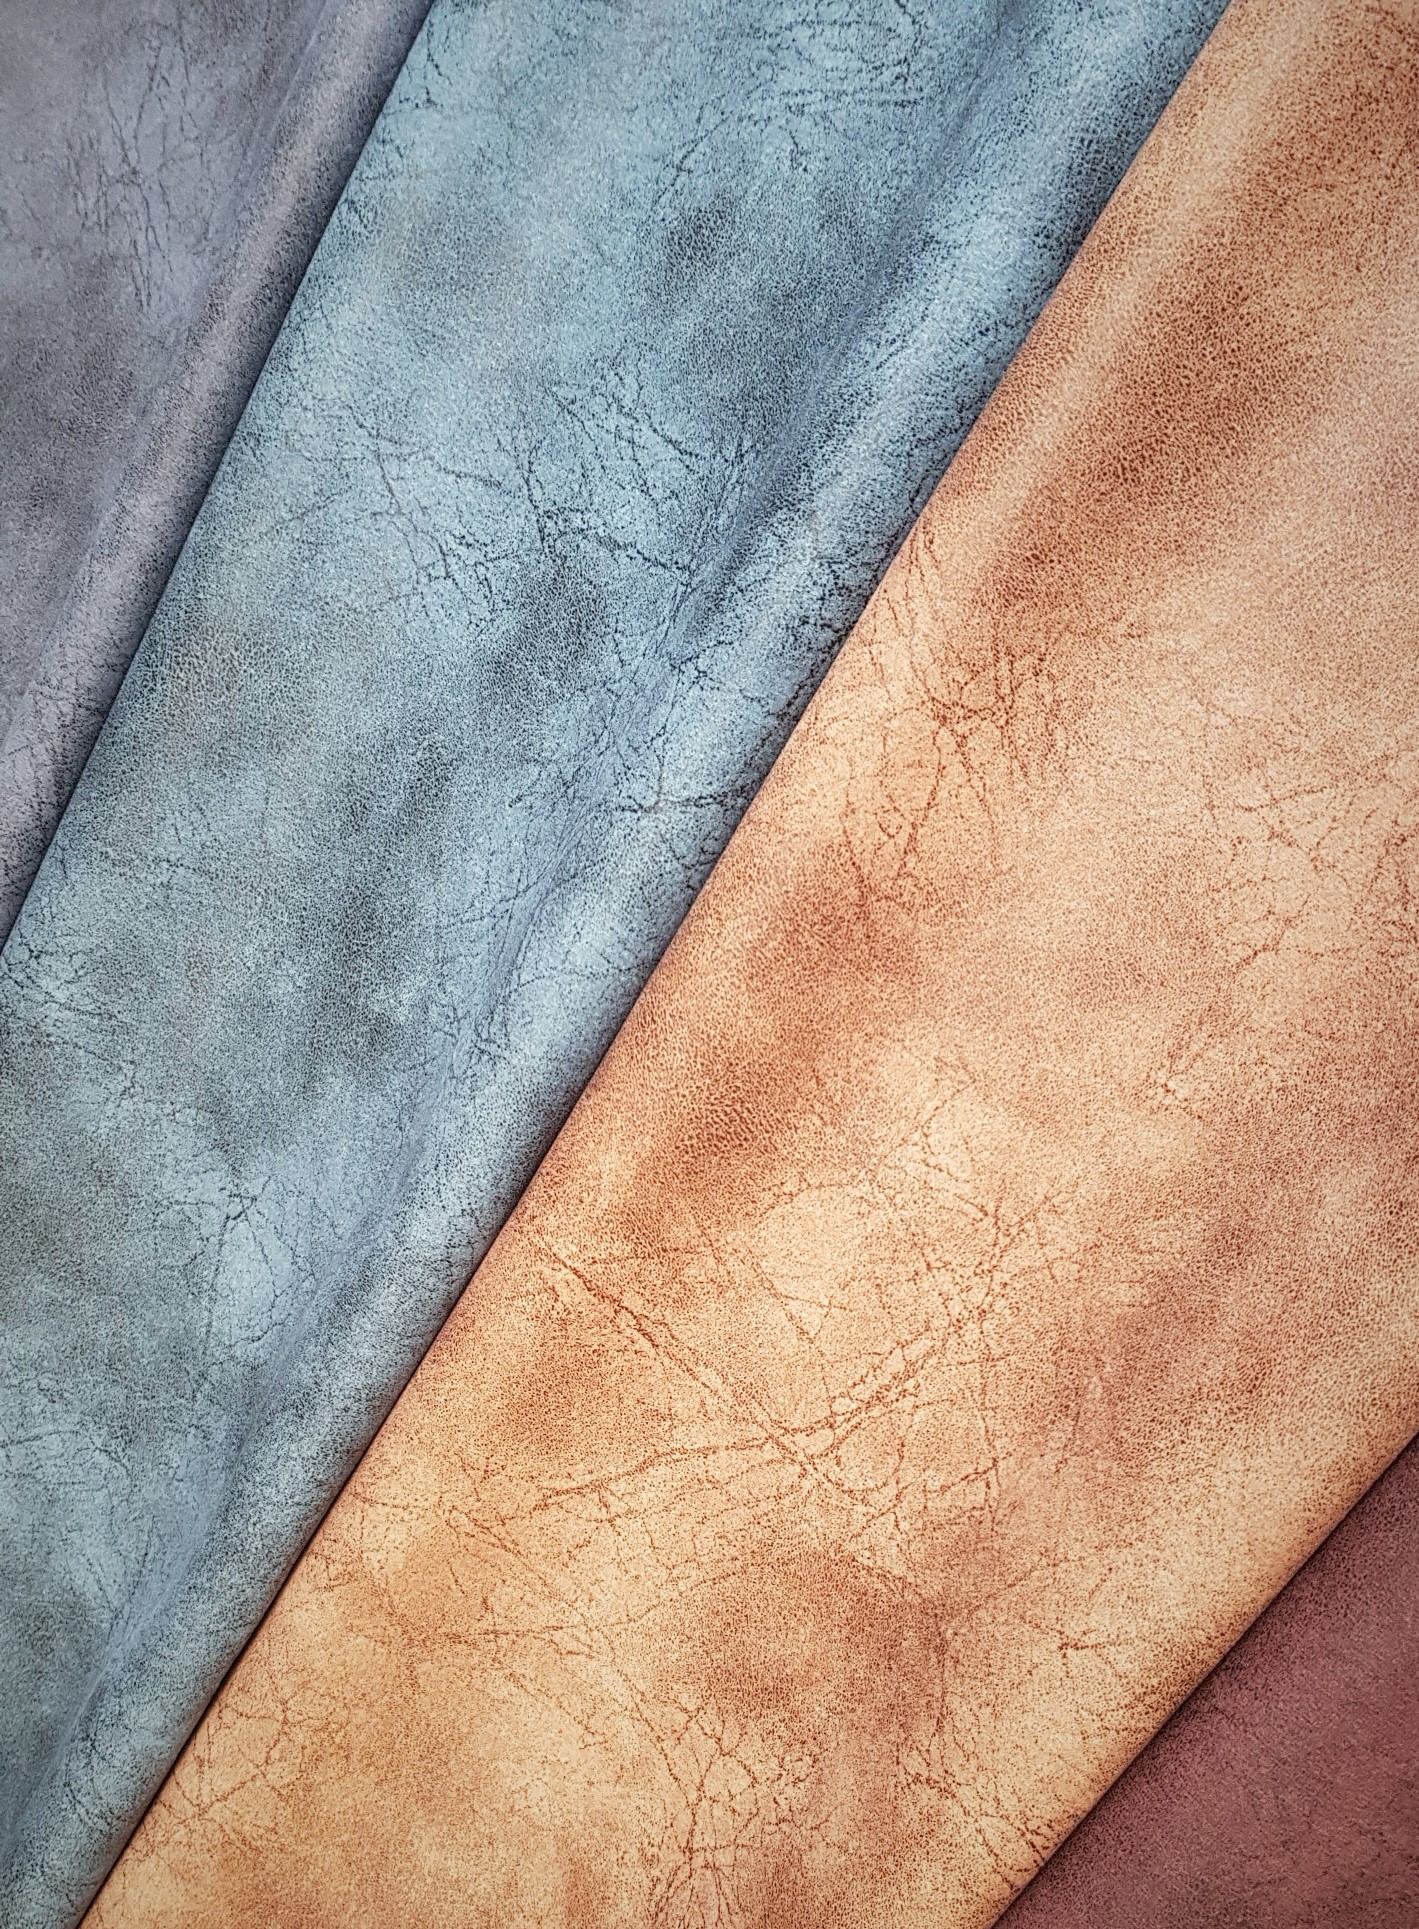 Fabric Sago - marboss service wholesaler of fabric